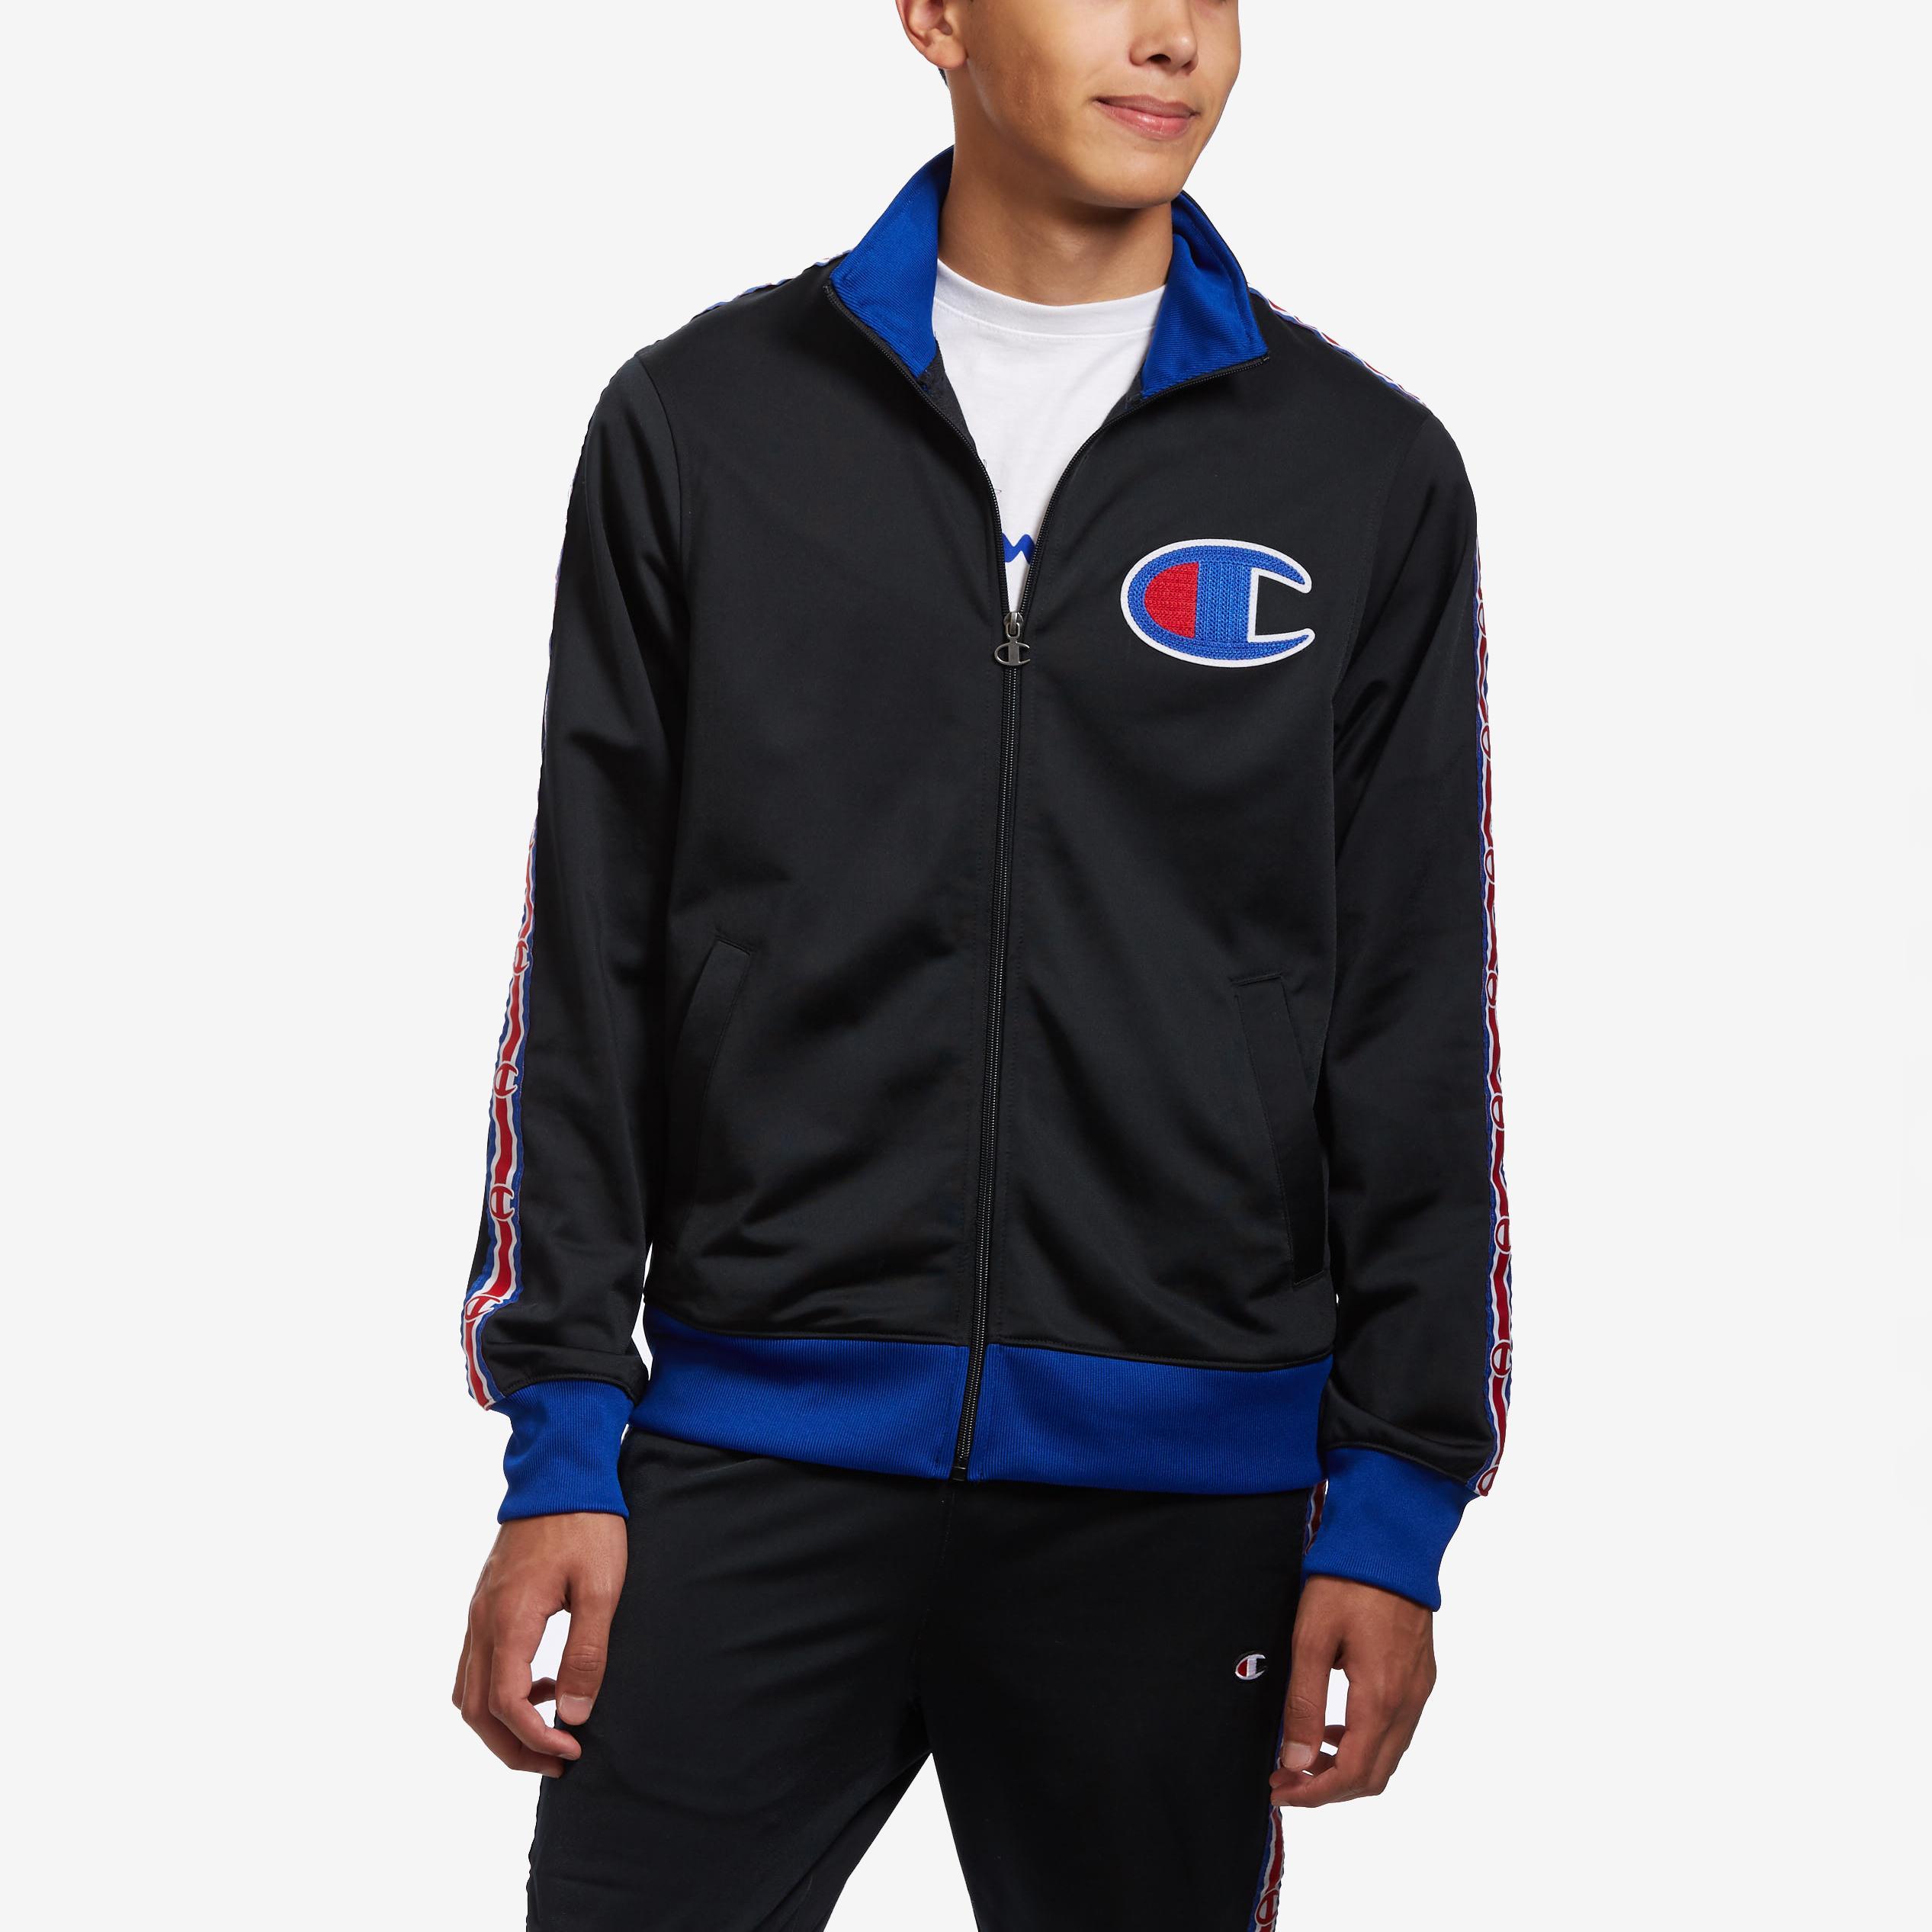 Life Track Jacket, Chain Stitch Big C Logo